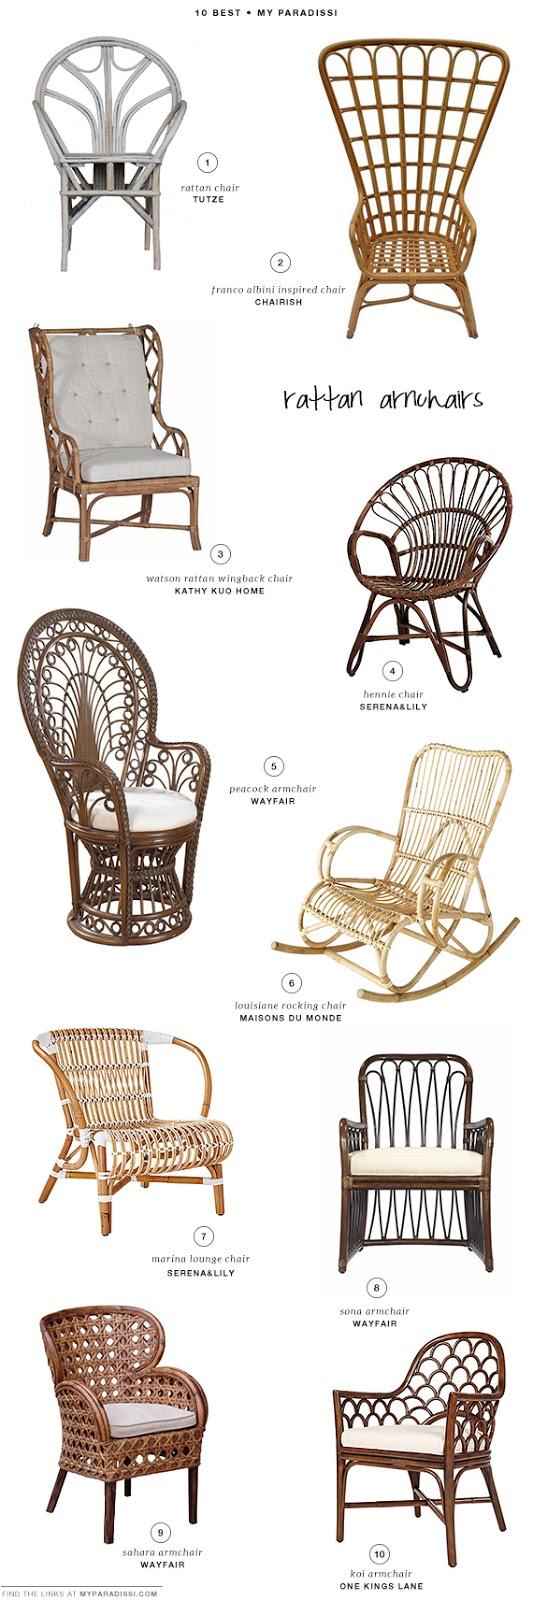 10 BEST: Rattan armchairs | My Paradissi